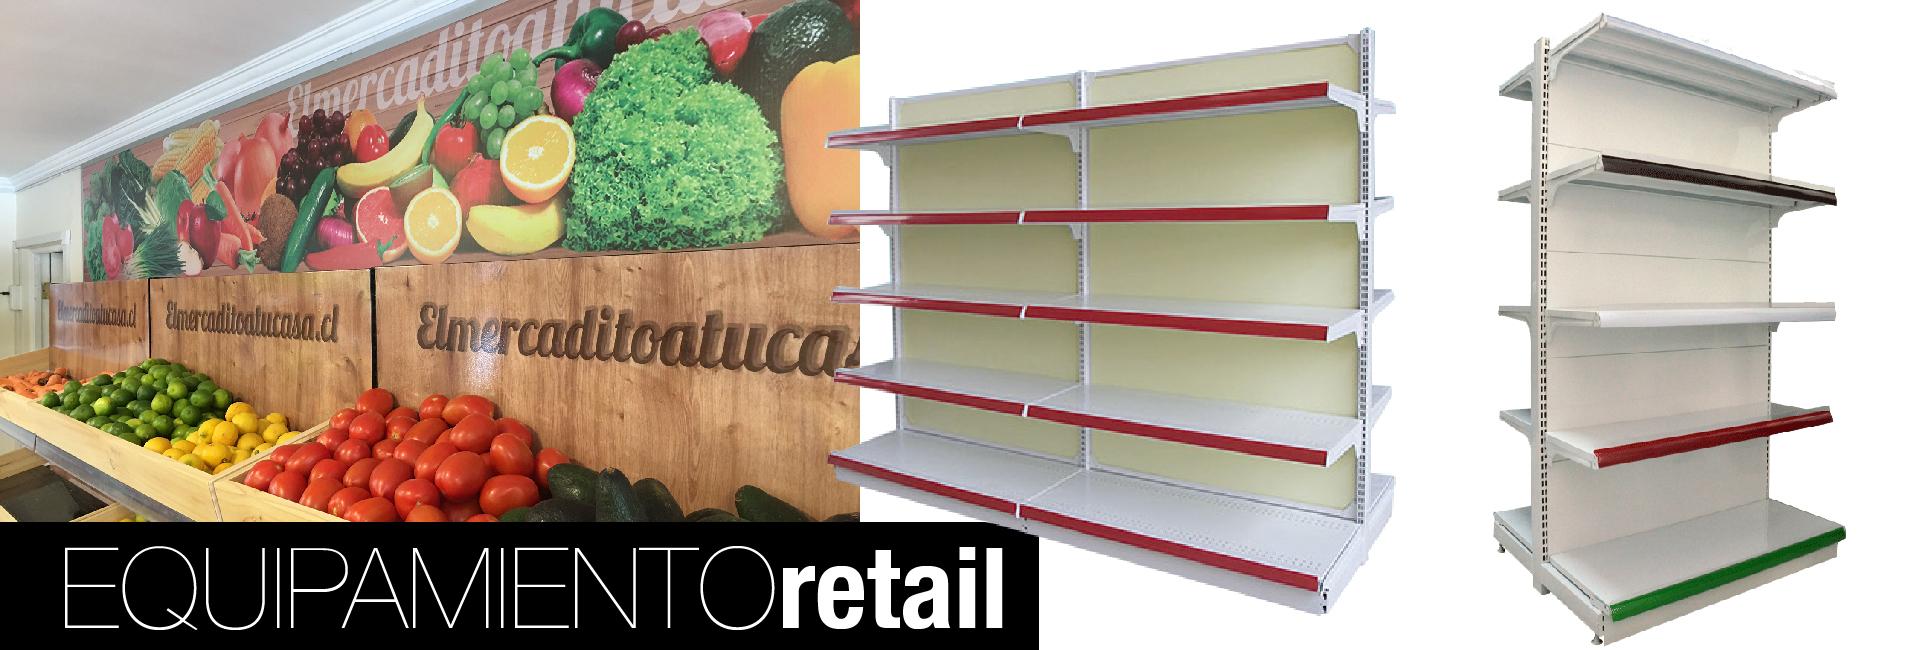 Equipamiento_Retail_2